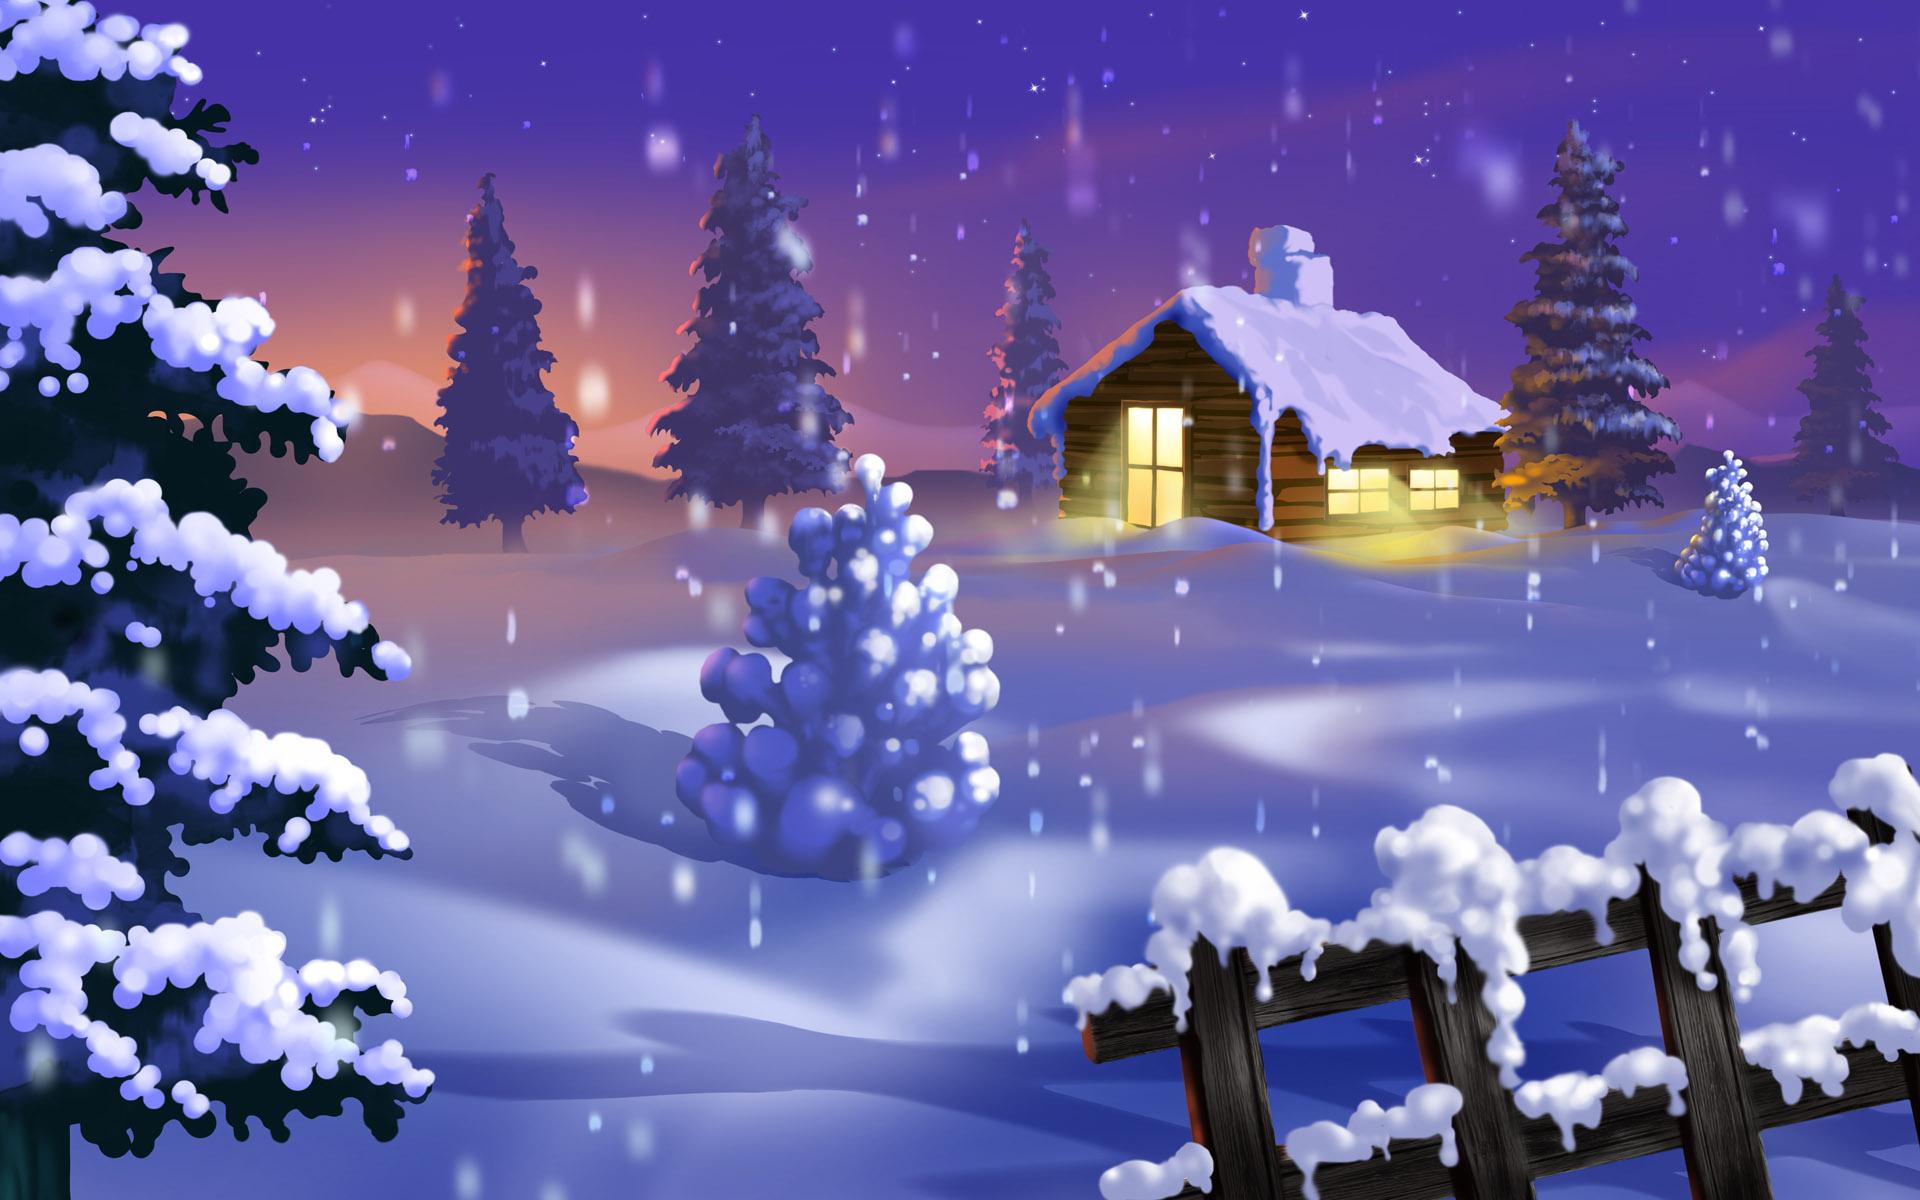 ... Wallpapers | Free Christmas Winter Wallpapers Download | Desktop